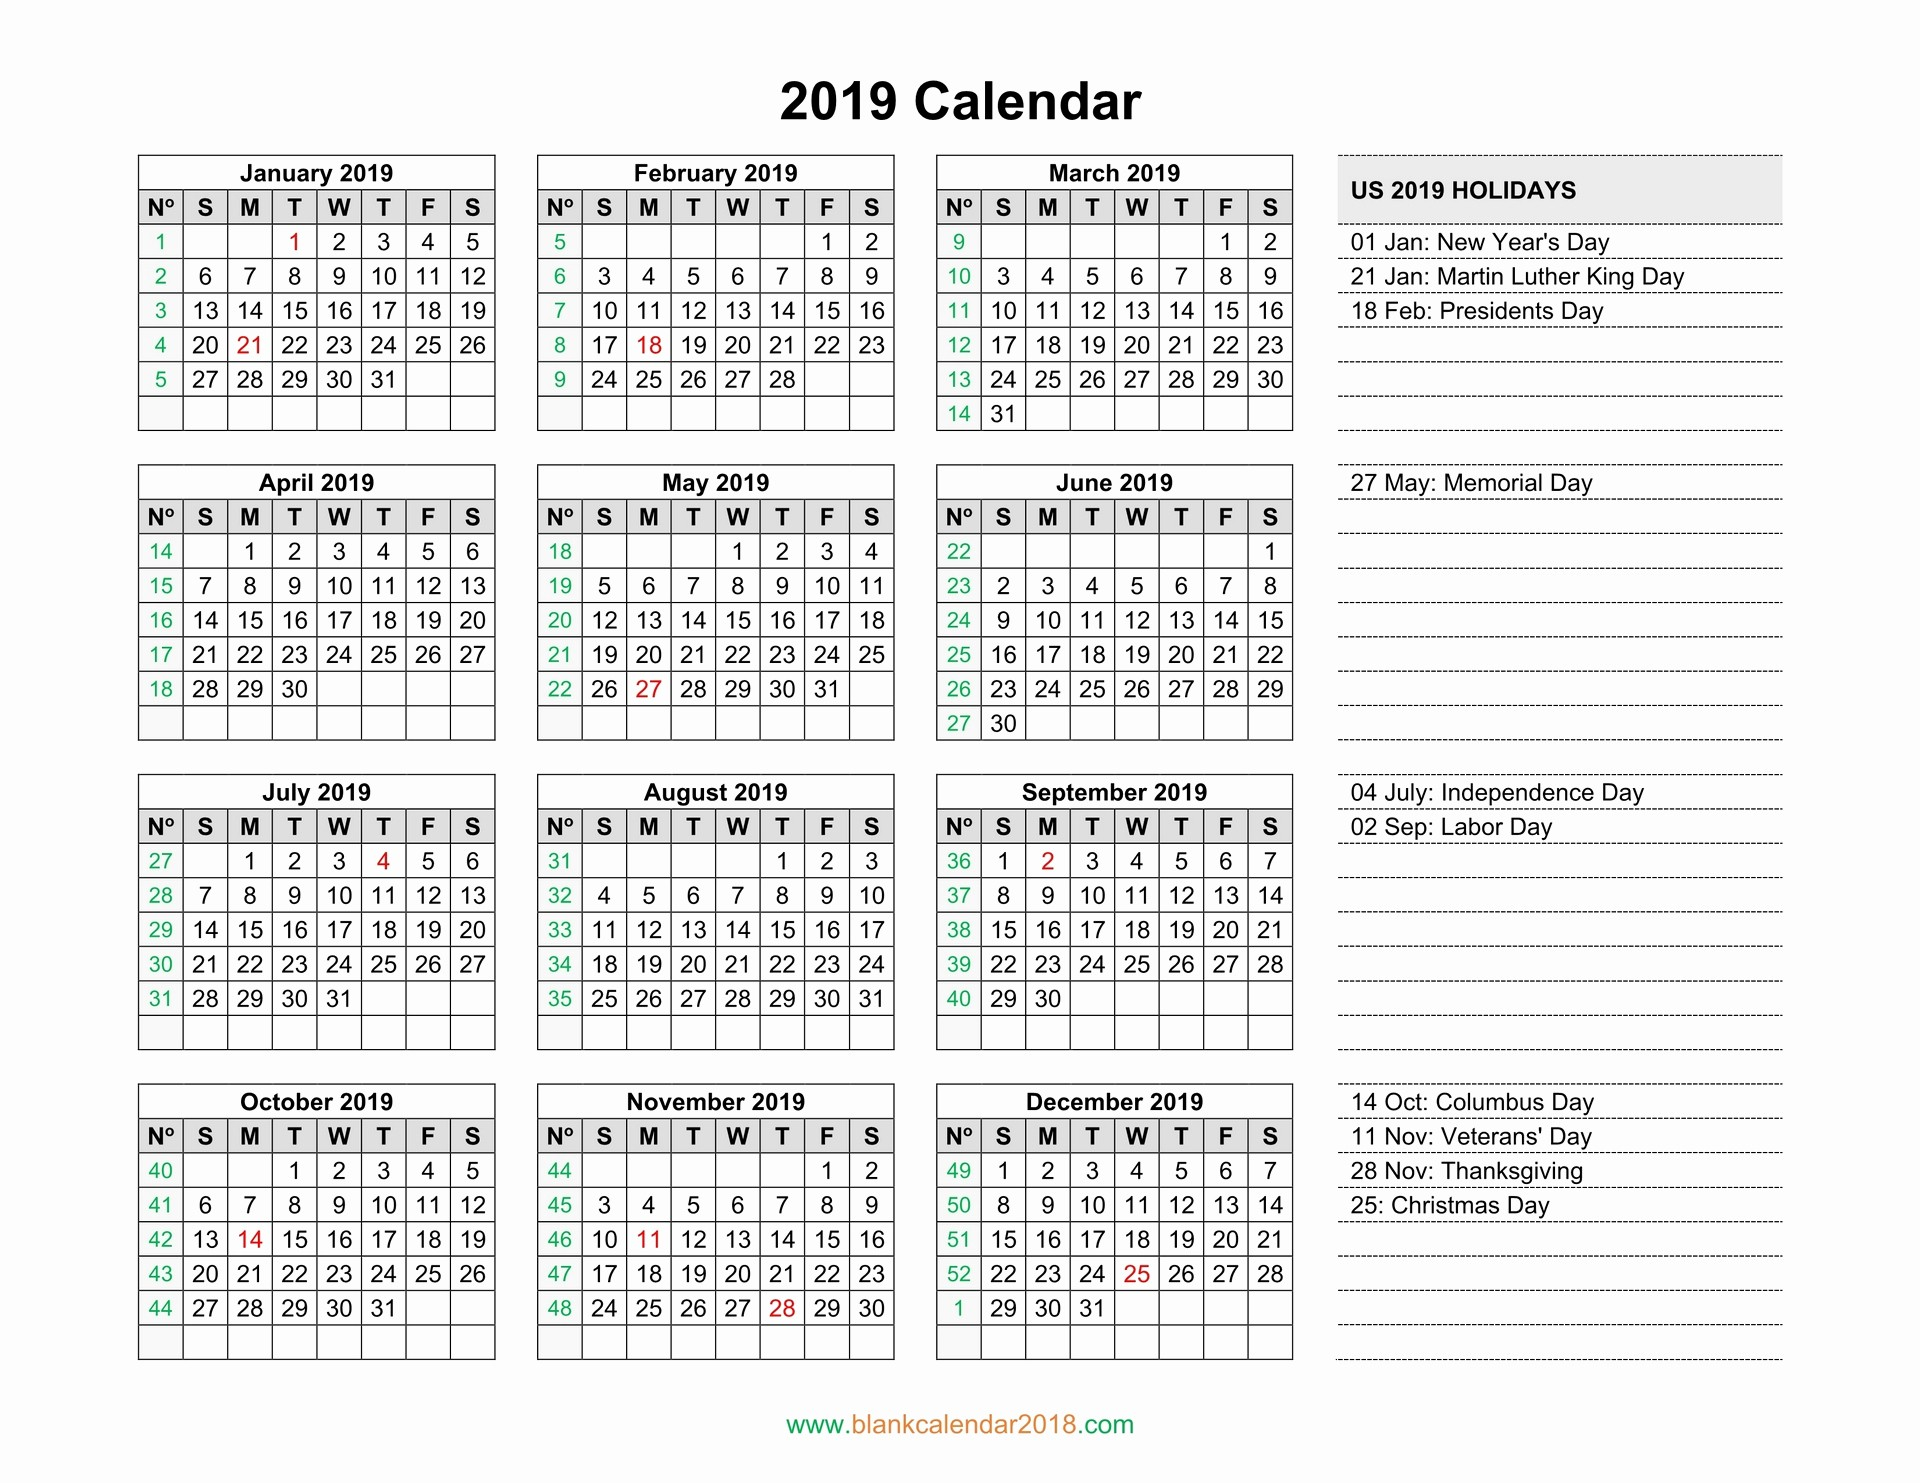 Free Printable 2019 Yearly Calendar Unique Blank Calendar 2019